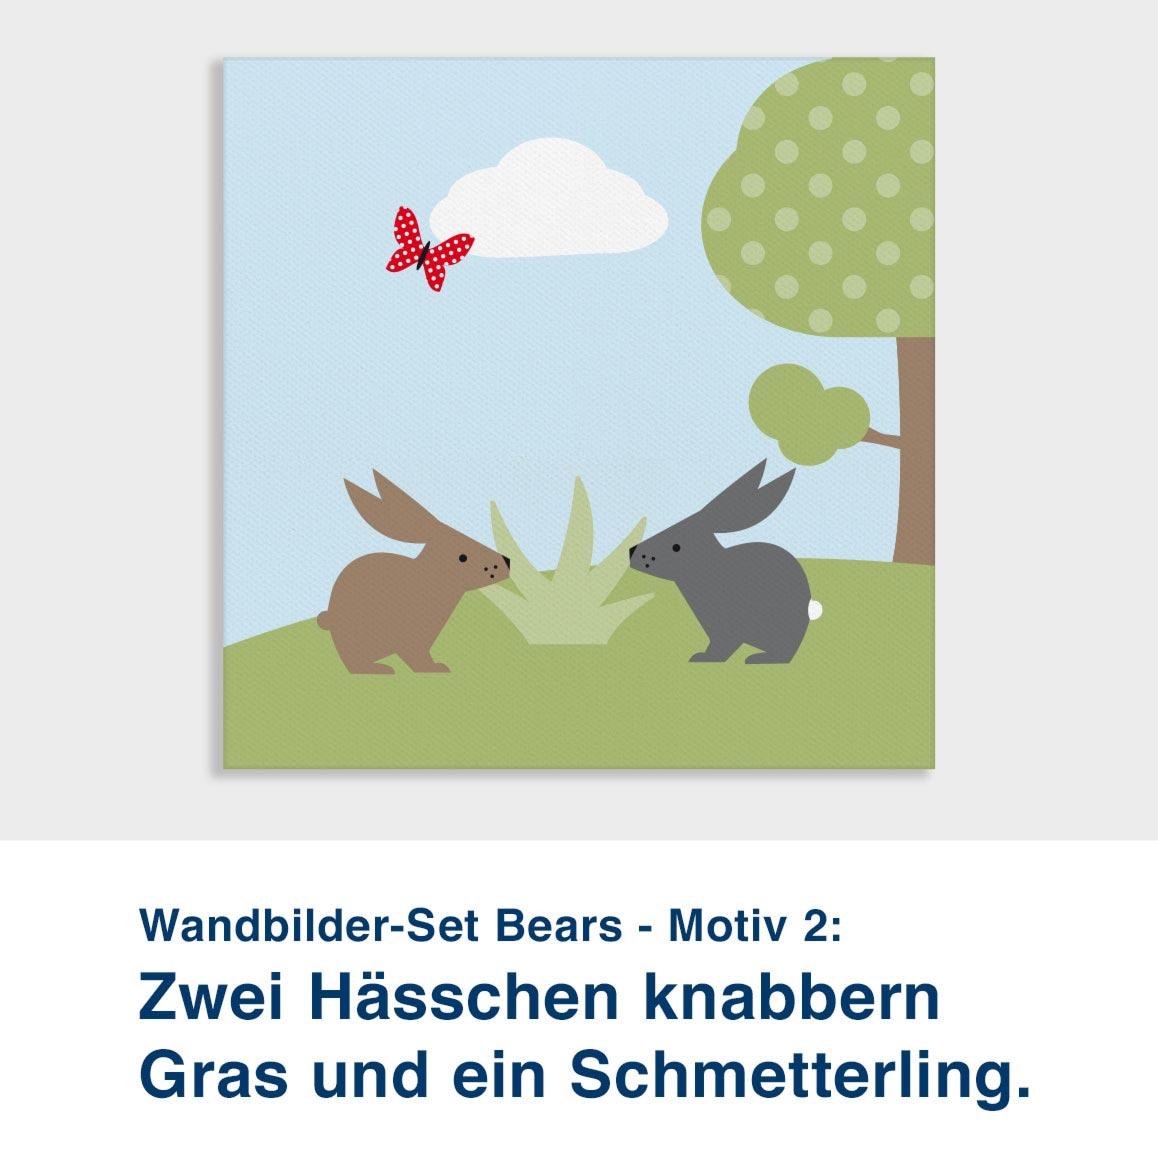 Wandbilder-Set Bears - Motiv 2:  Zwei Hässchen knabbern Gras und ein Schmetterling.